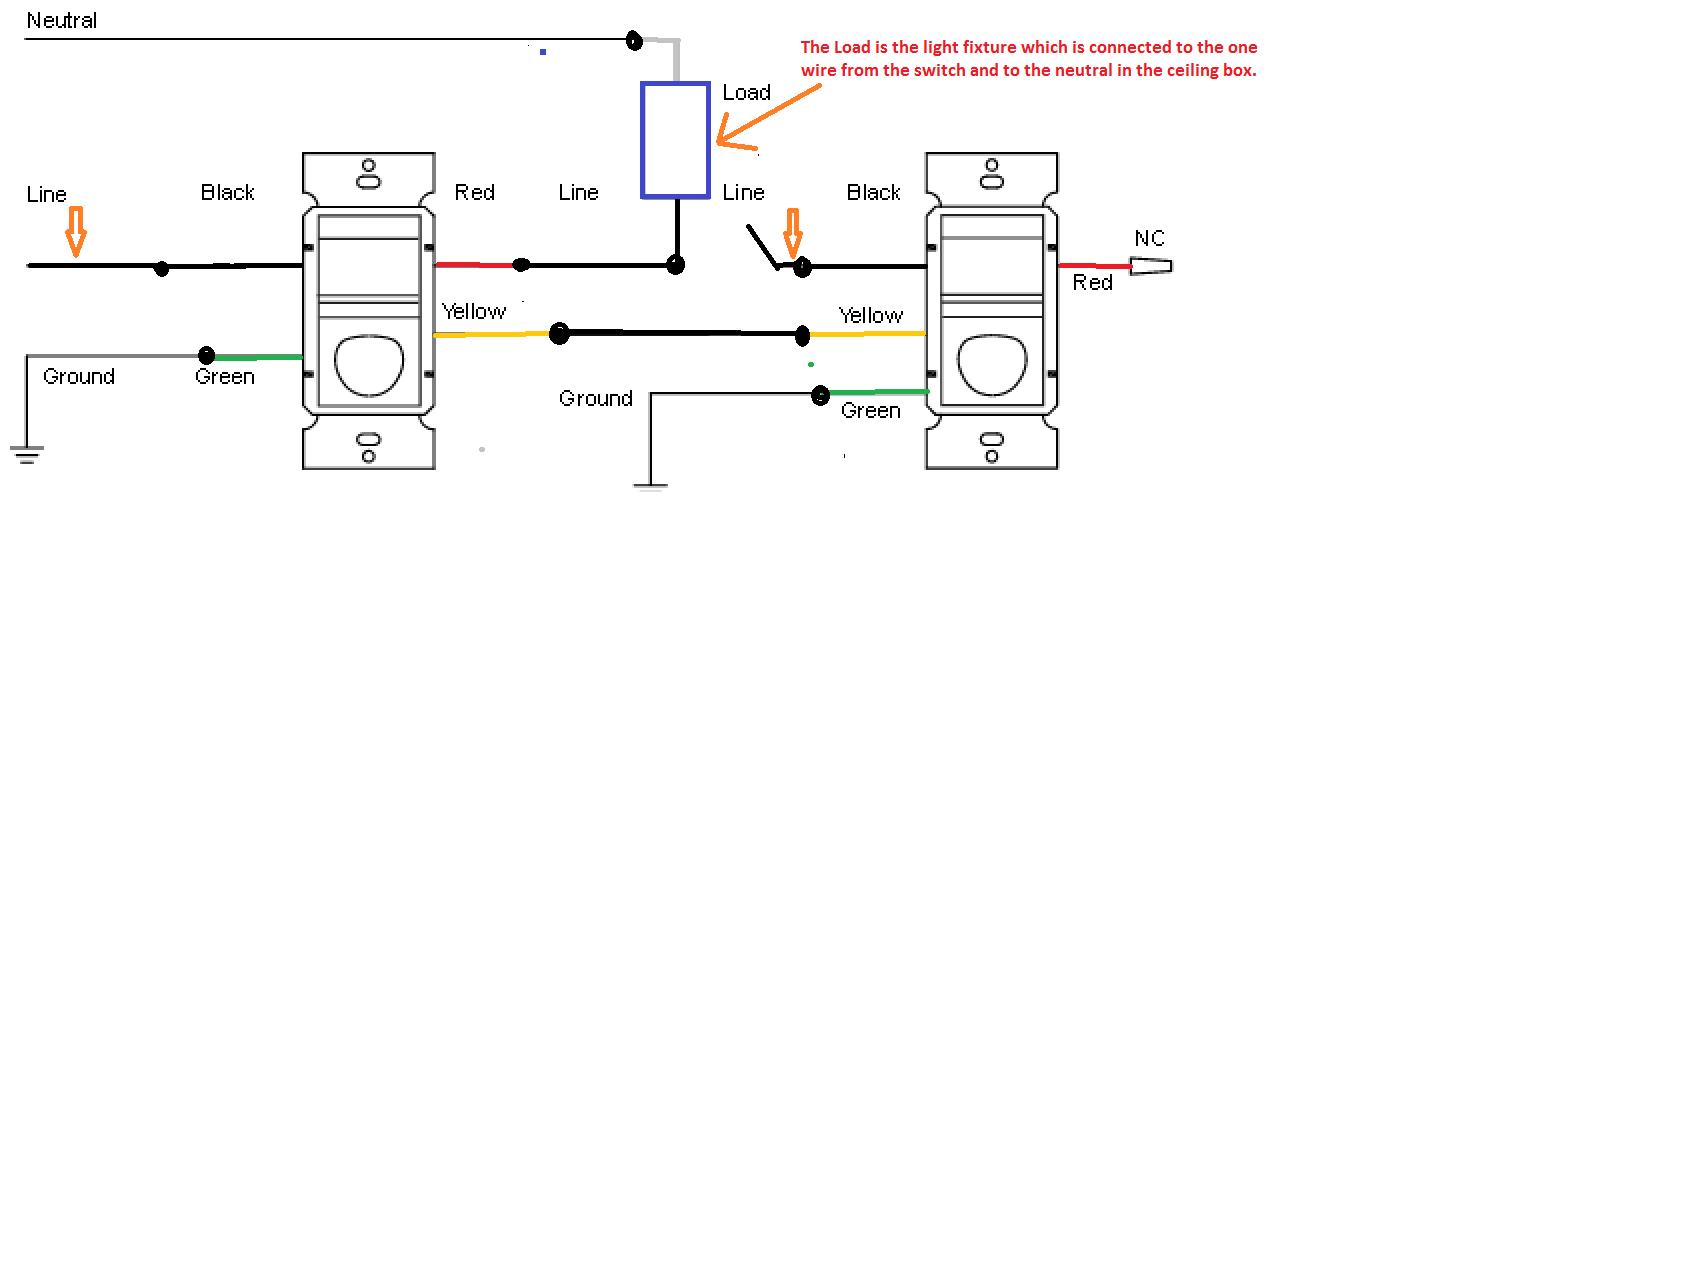 47edaefd-c82b-46bf-89ab-95a7c6553c18_Legrand RW600U.png